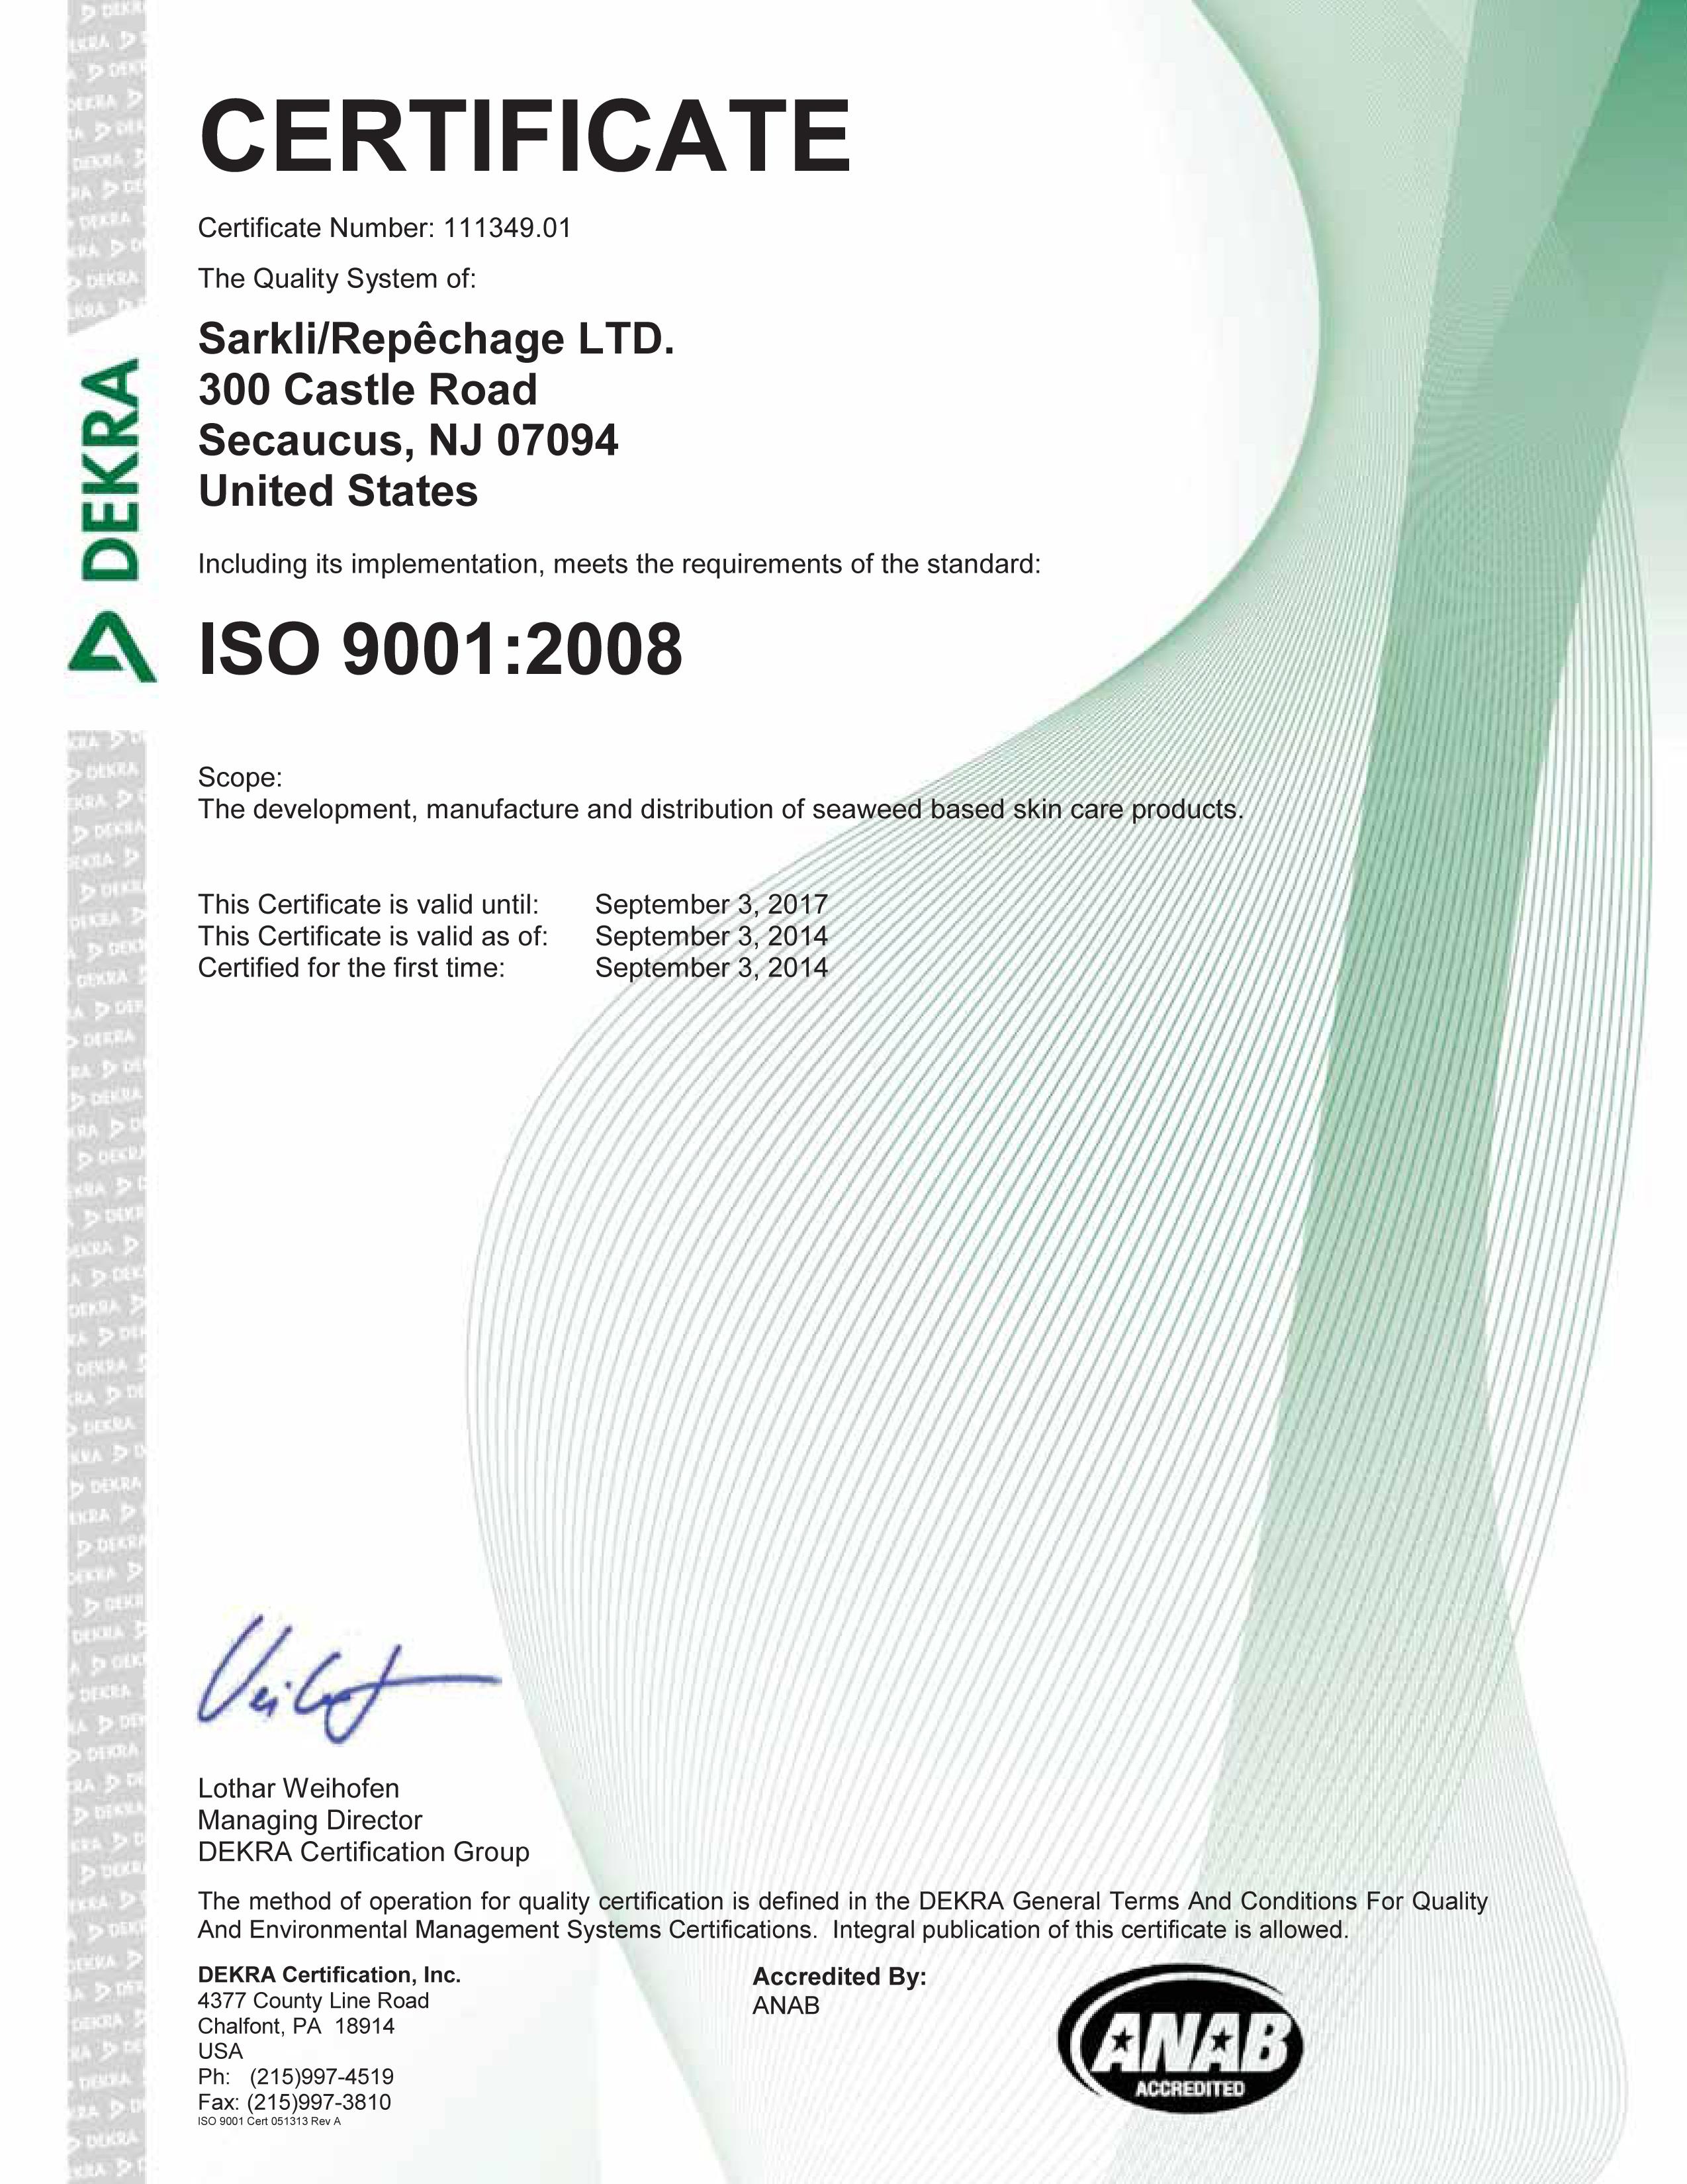 Repchage now iso 9001 certified lydia sarfati skin care blog repchage now iso 9001 certified 1betcityfo Gallery